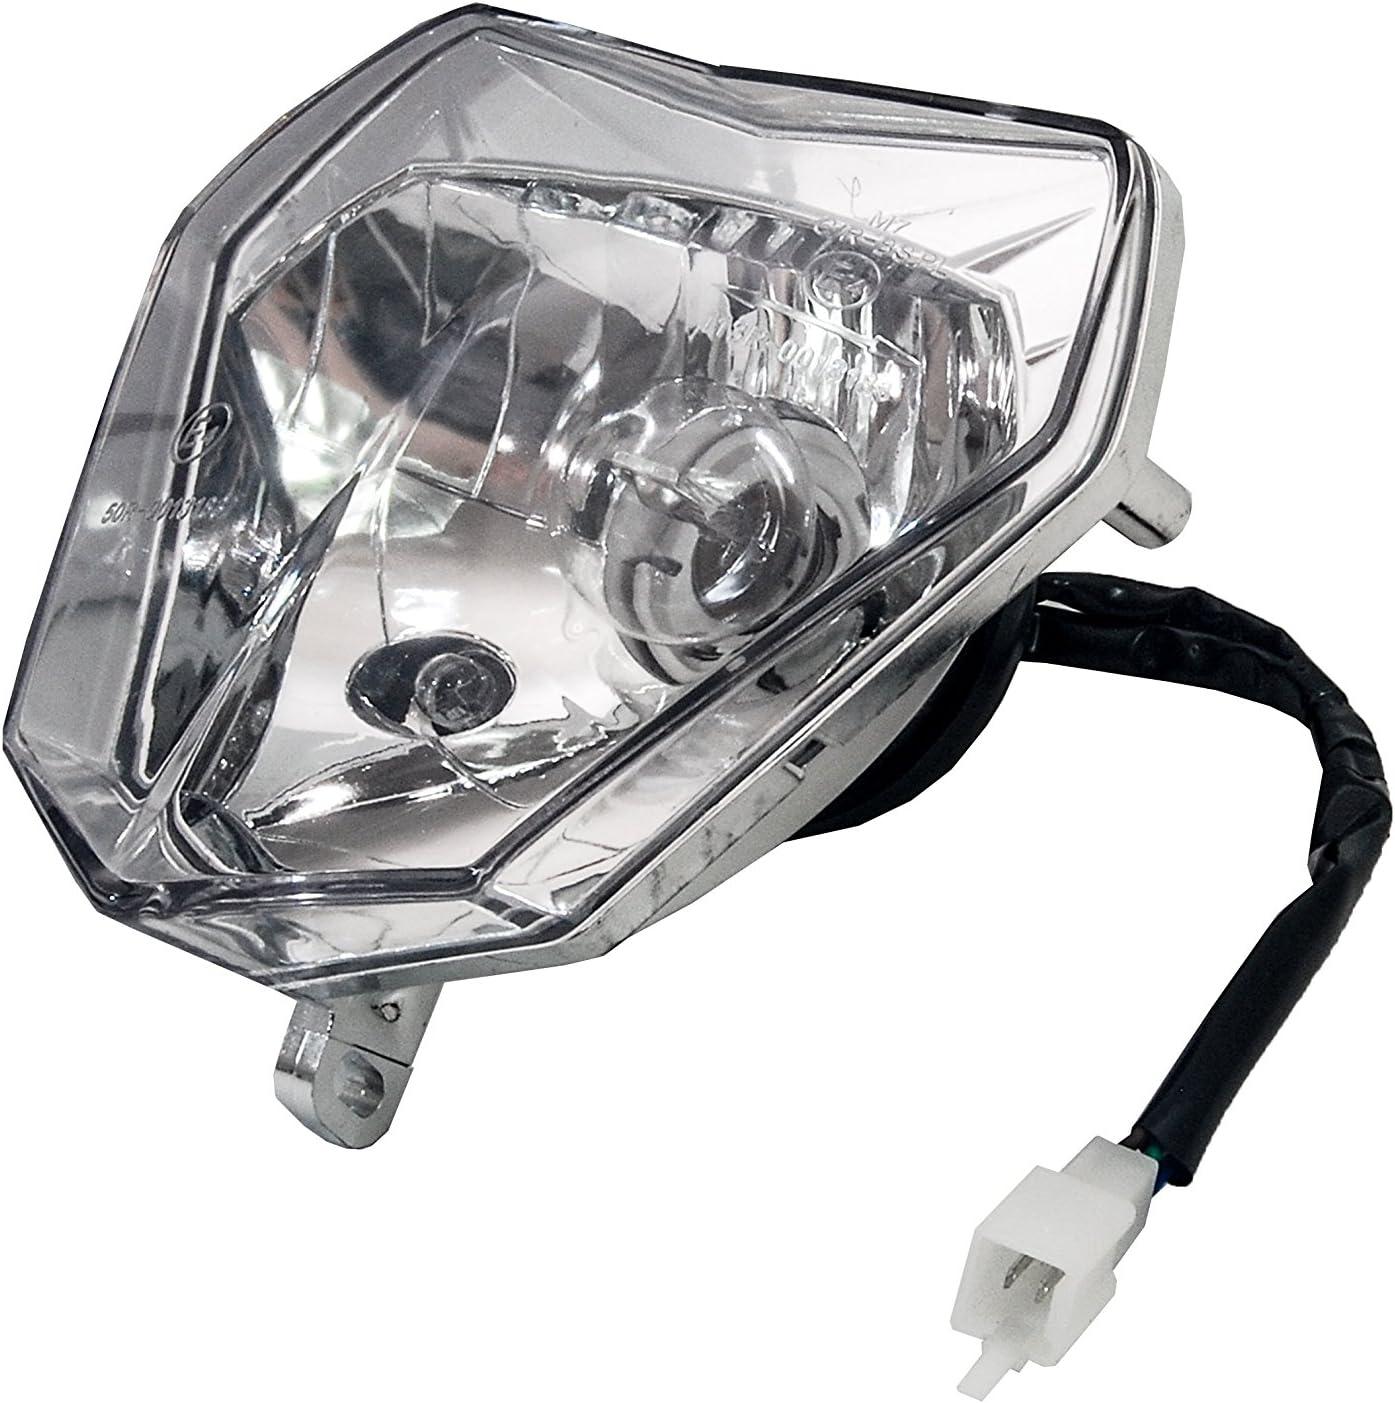 Plastic Headlight Head Light Lamp StreetFighter For KTM SX SXF XC EXC XCW Orange